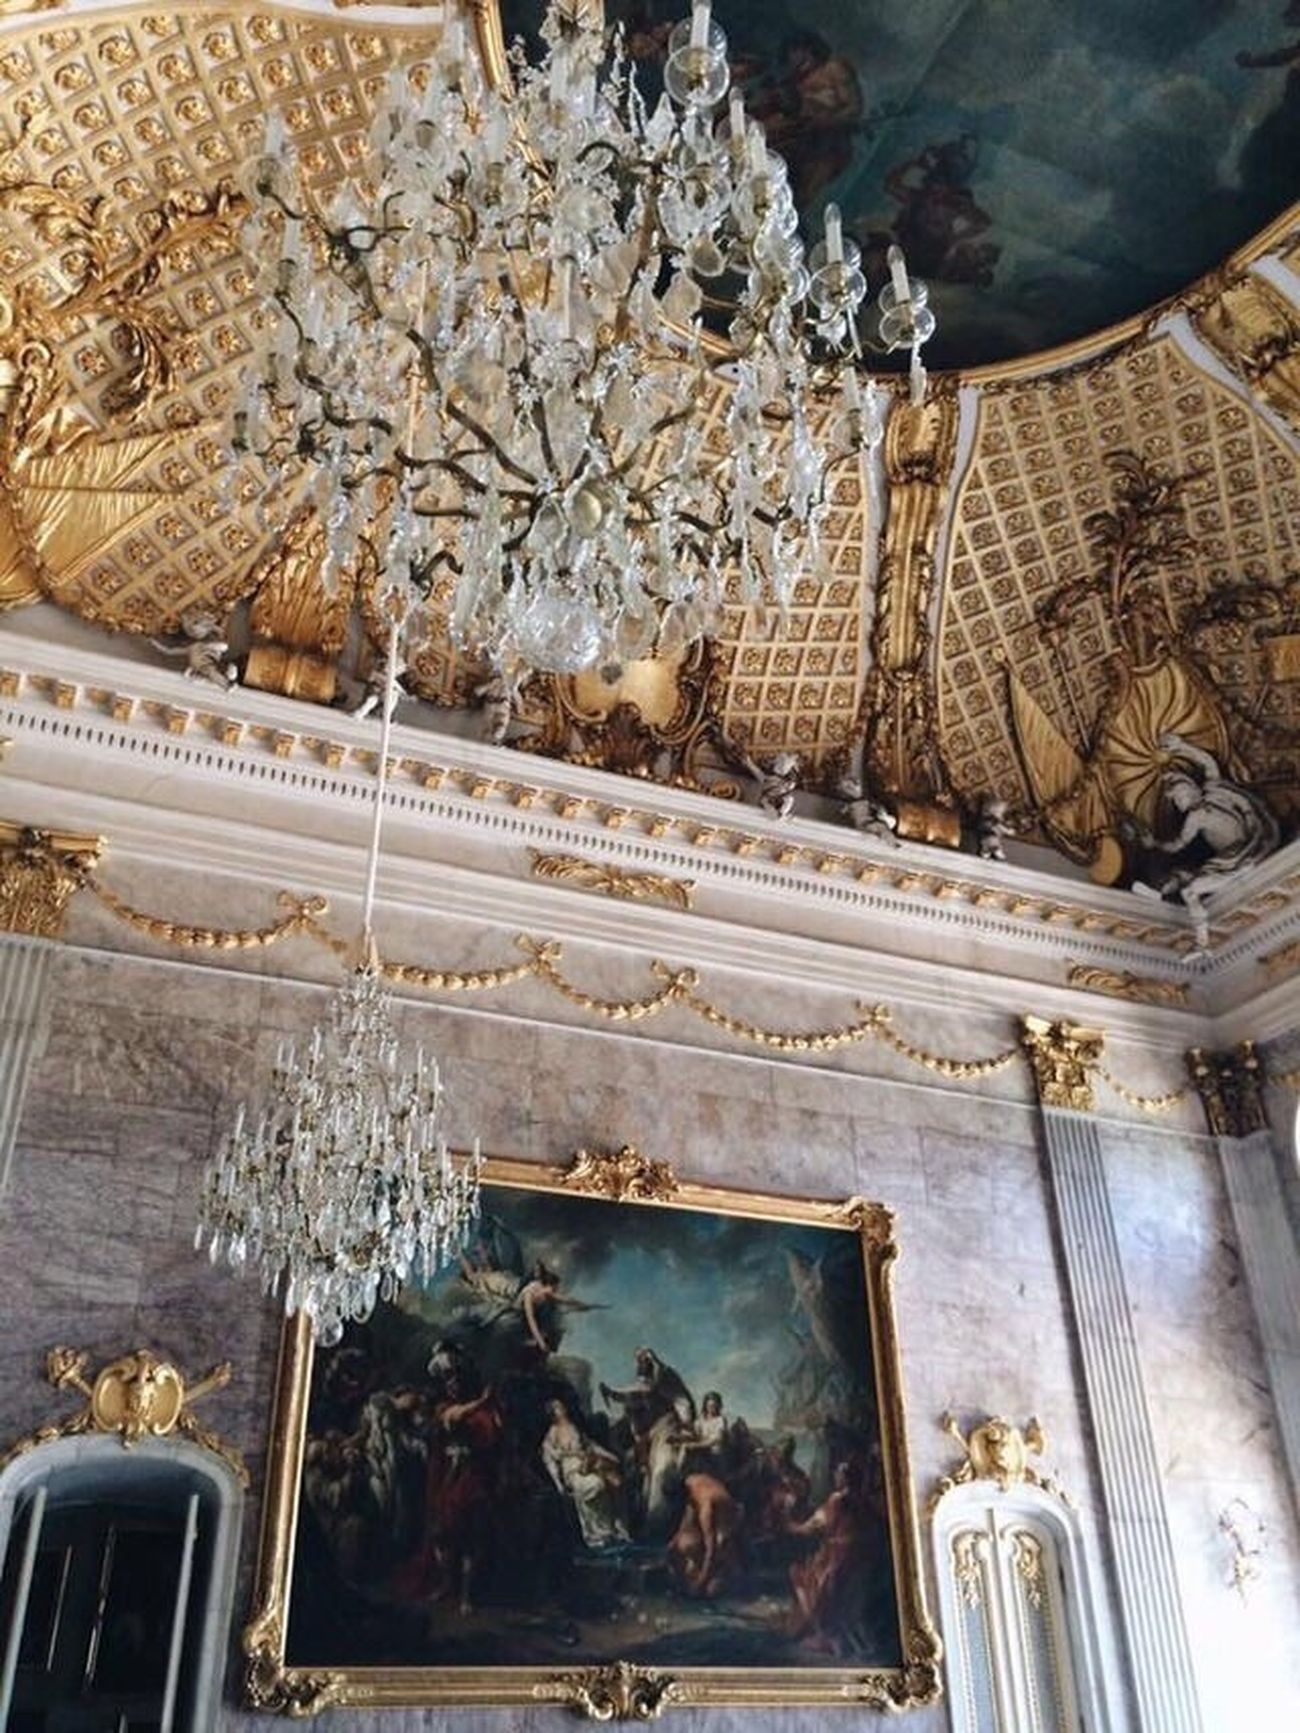 Germany Potsdam Potsdam Sanssouci Neuepalais Interior Design Interior Architecture Rococo Ceiling Indoors  Decoration Decor